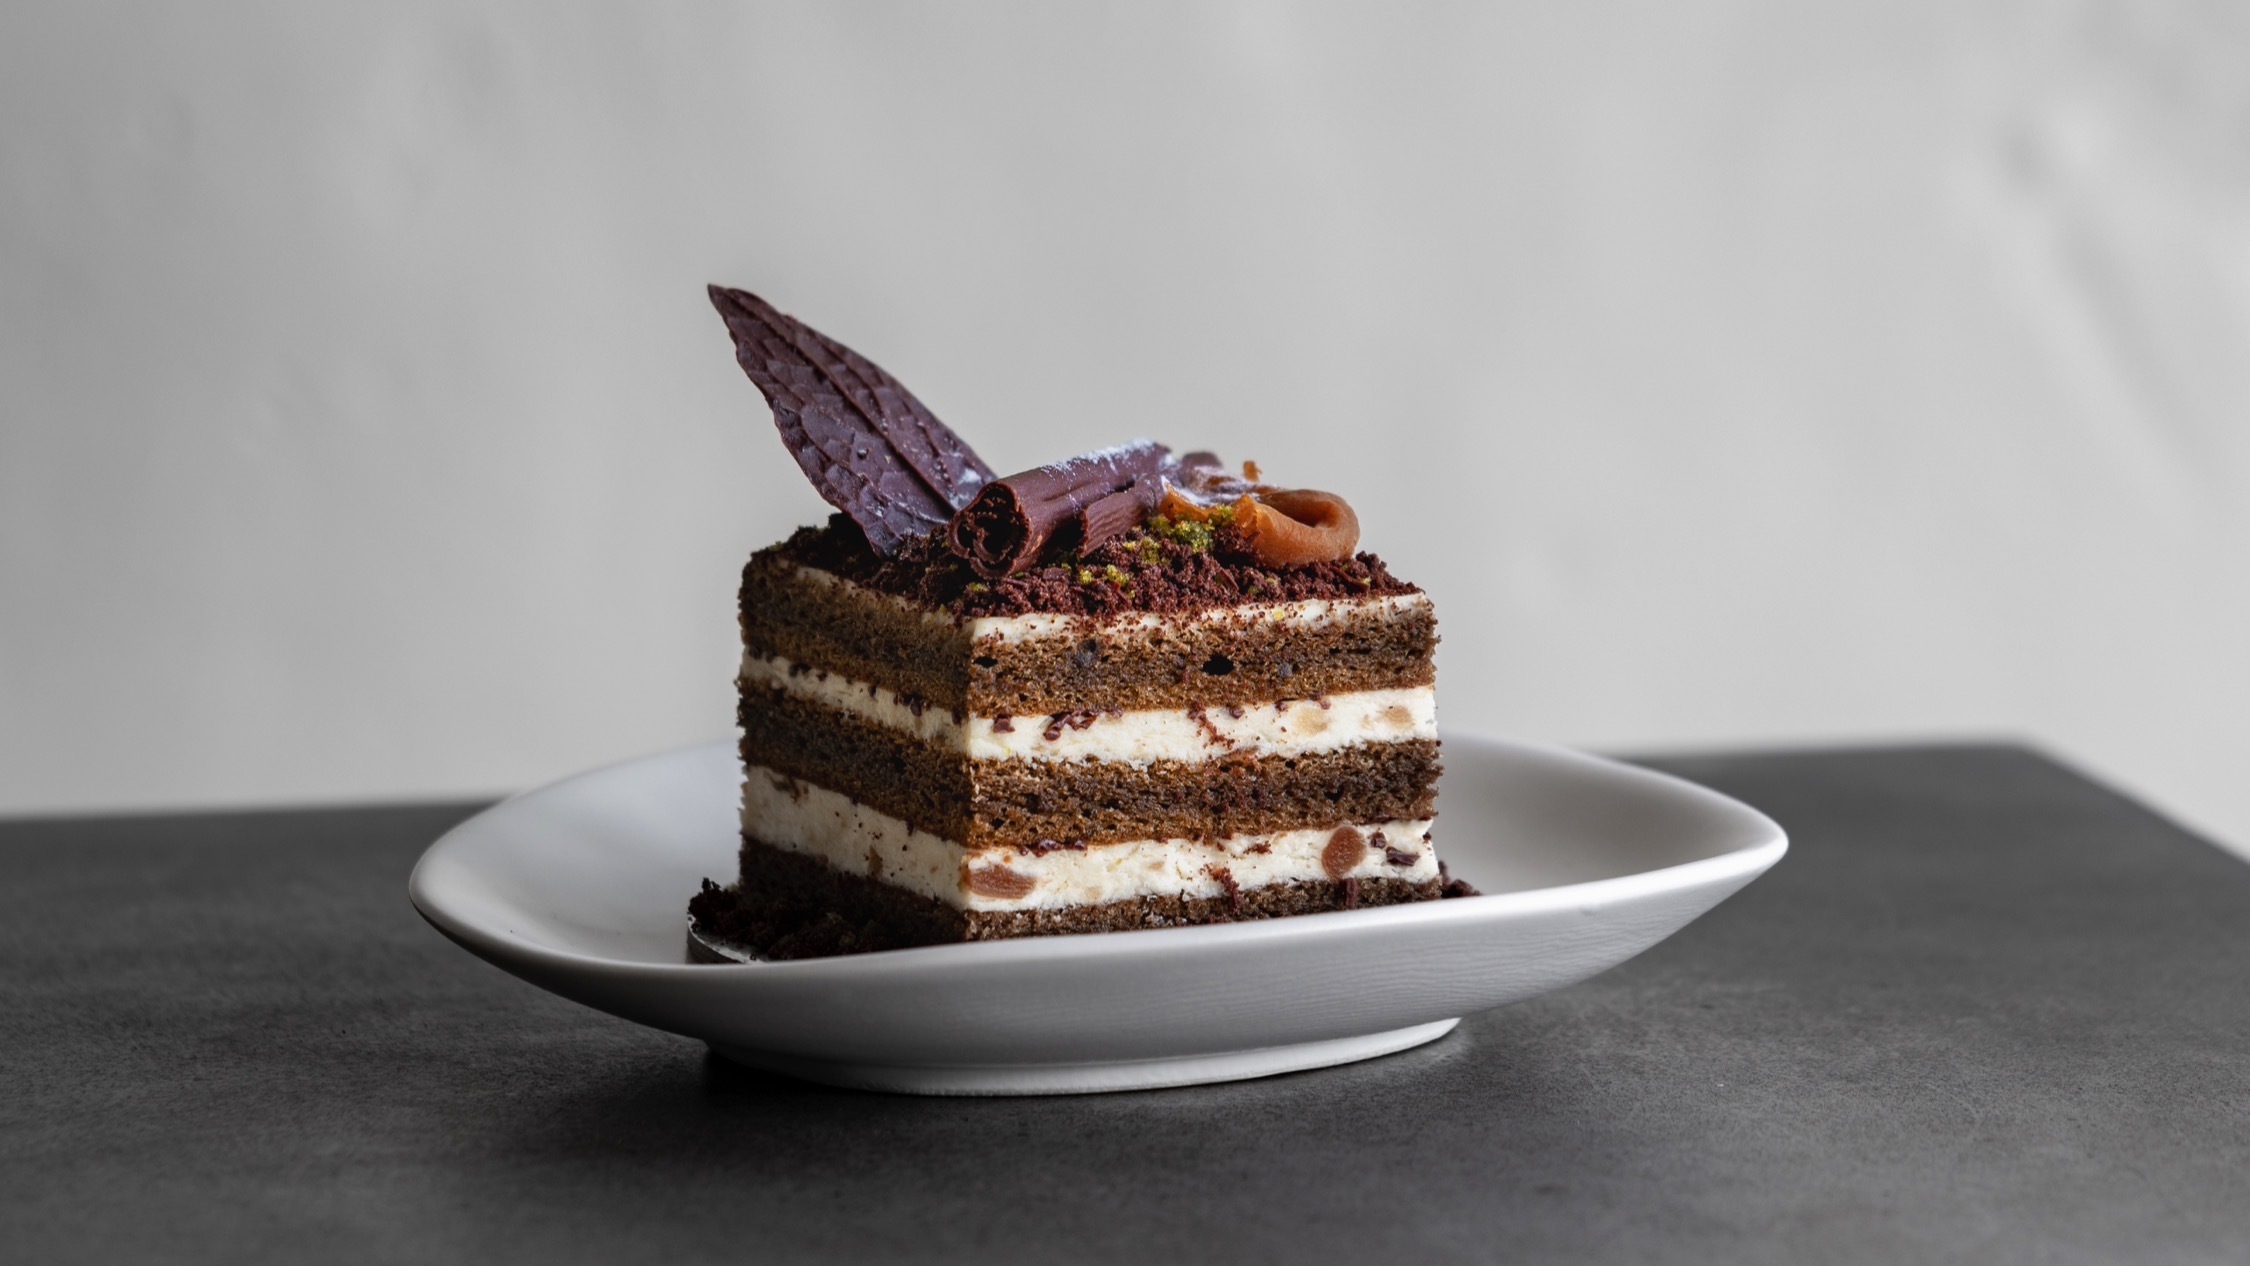 Cake at Black Star Pastry